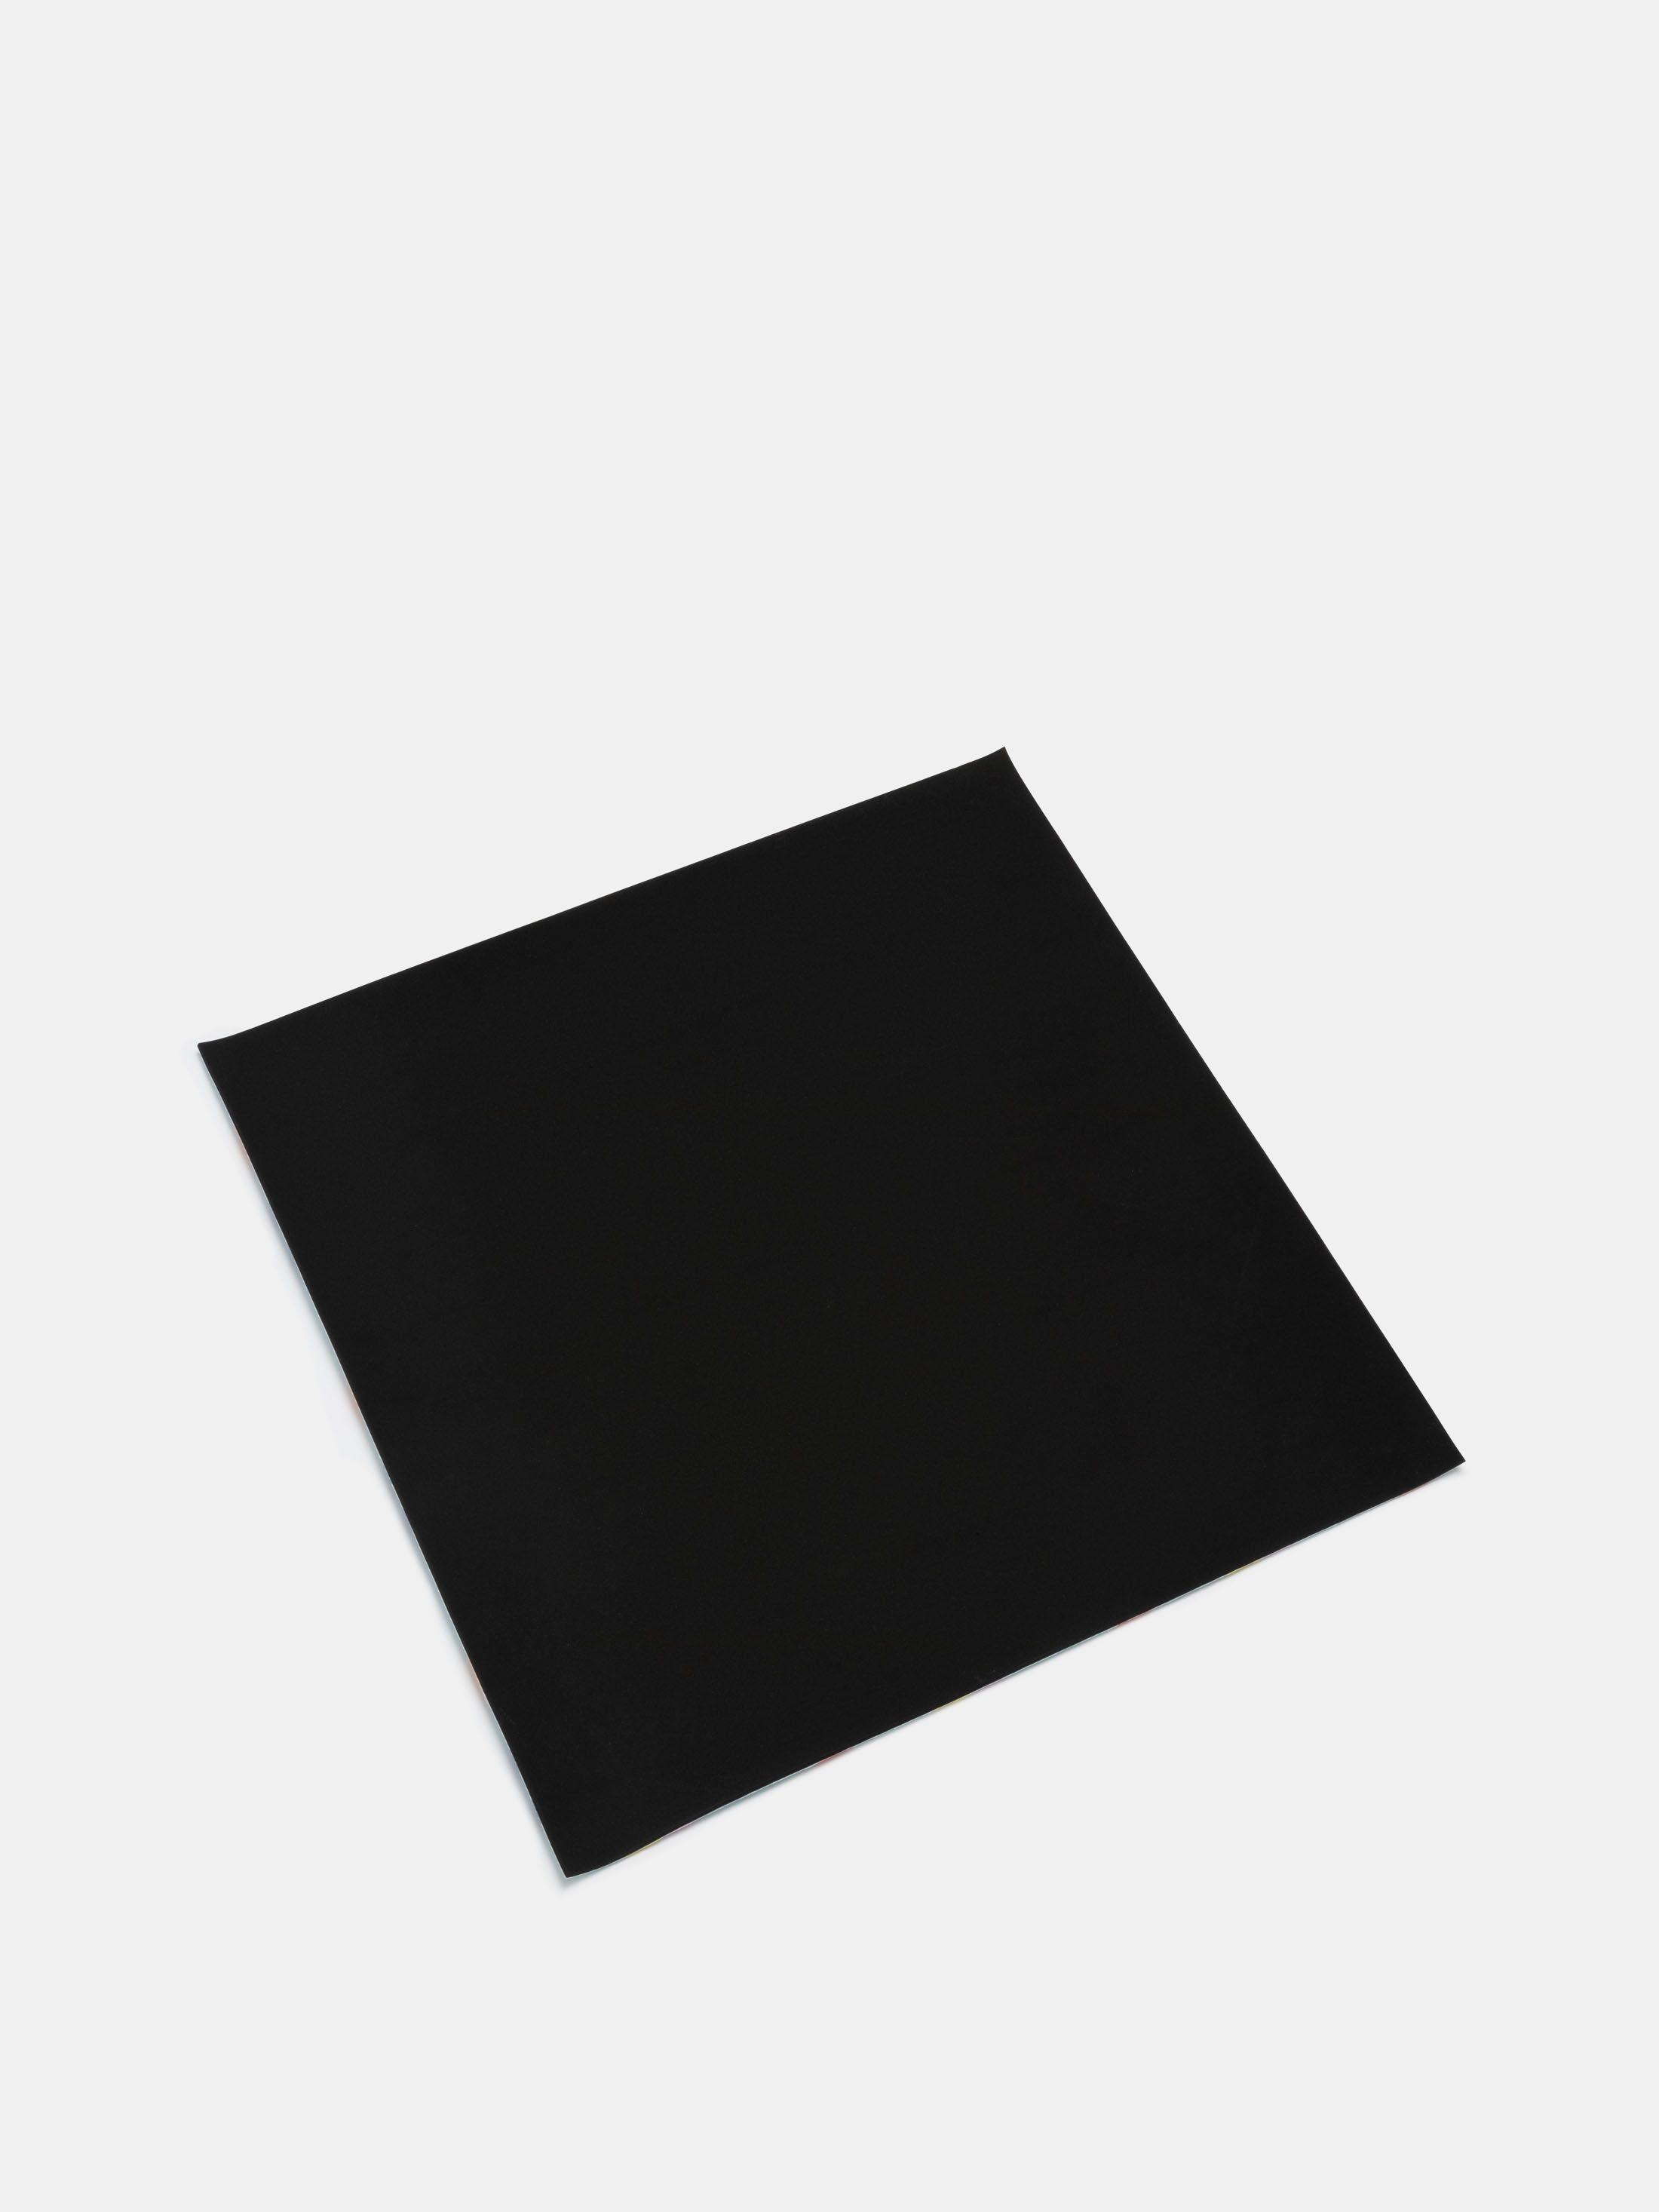 Spielmatte bedrucken lassen